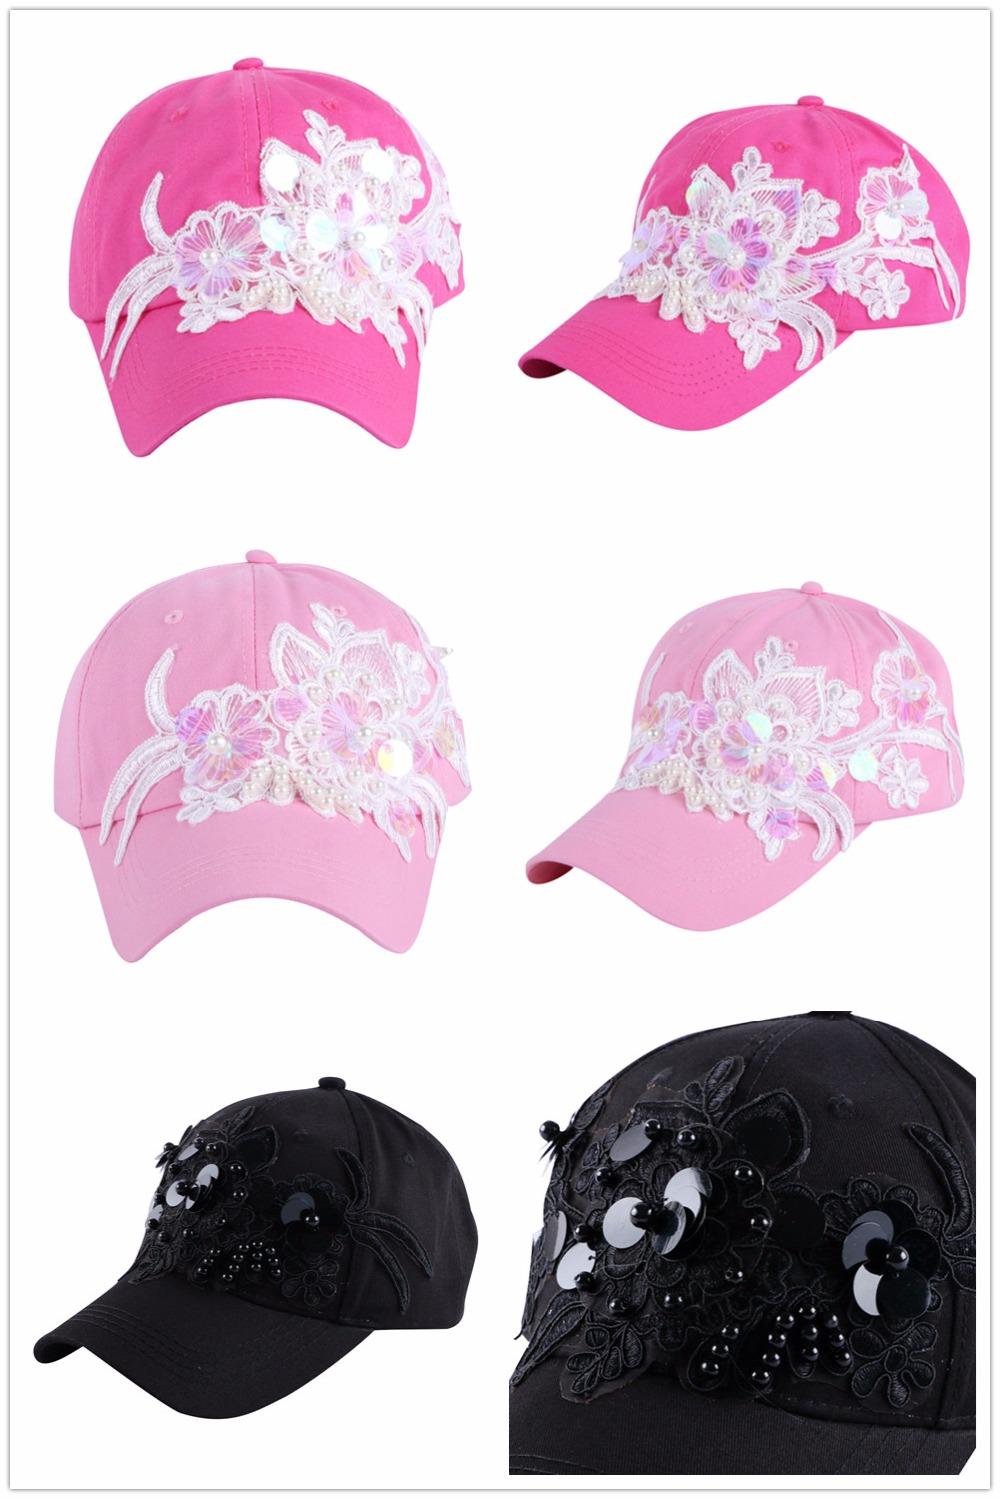 High Quality WOMEN brand baseball cap new fashion rhinestone crystal denim snapback caps wholesale woman hip hop snapbacks hats 9